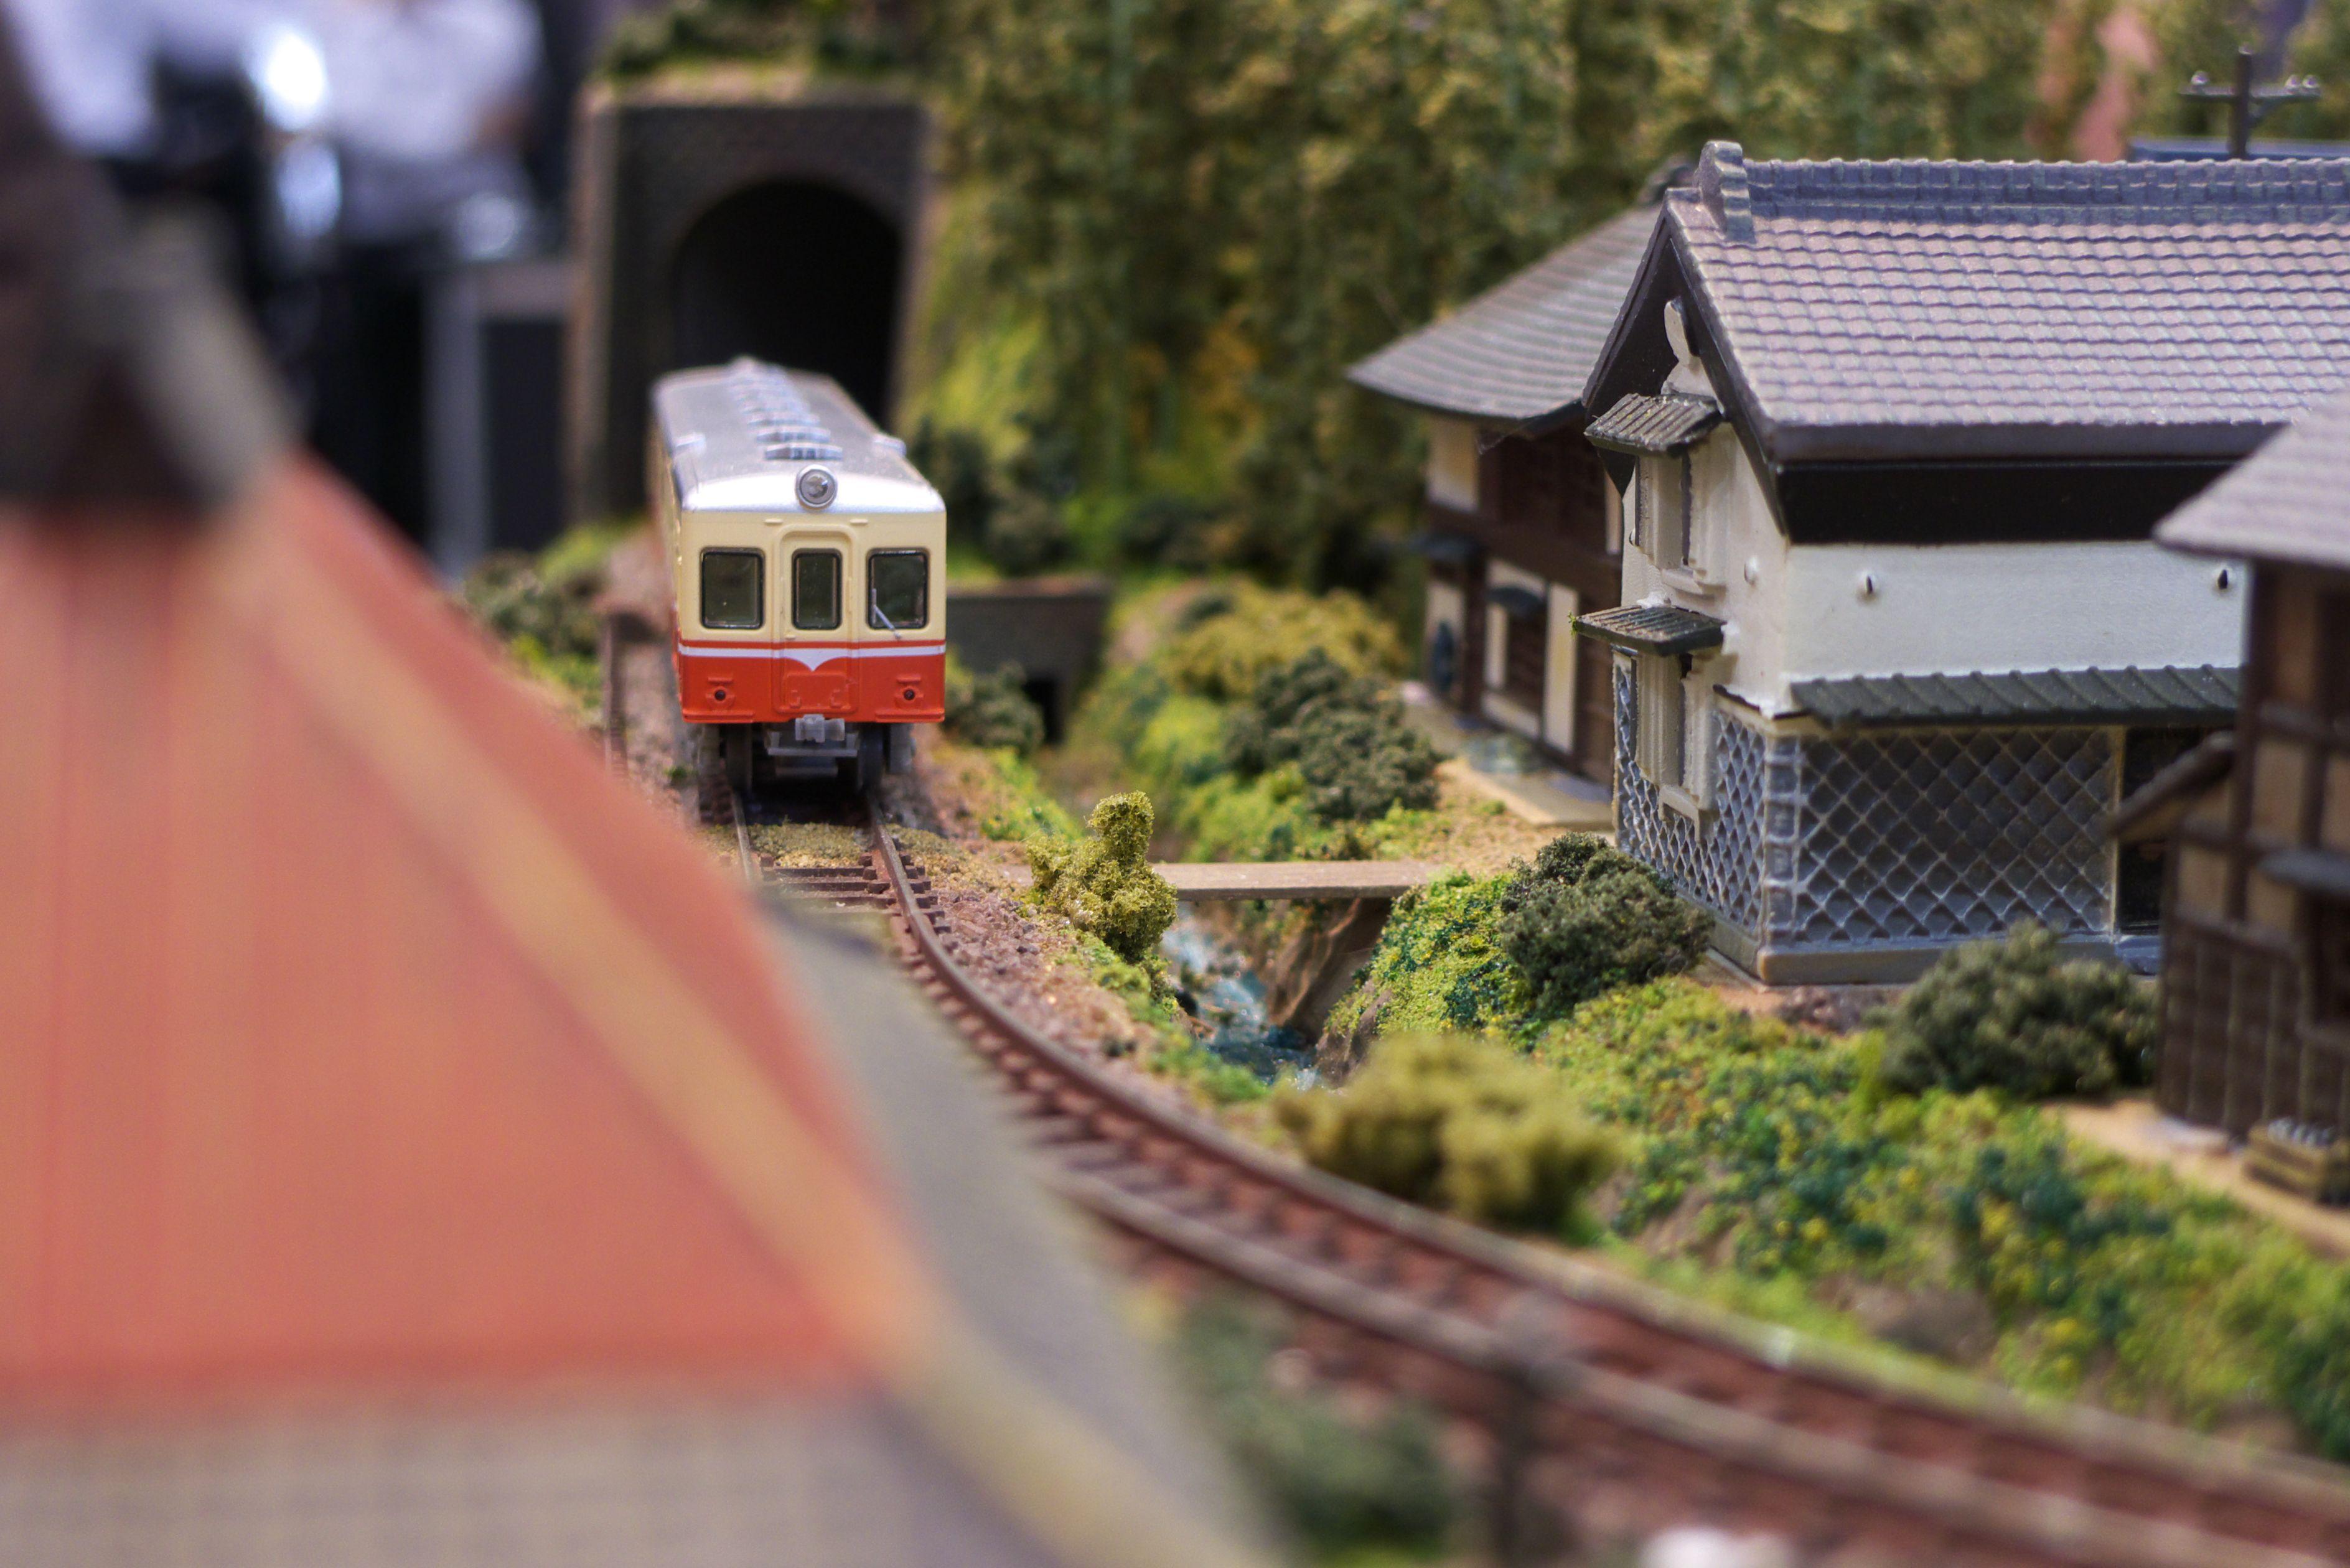 The model of a train Diorama | Cool | Model trains, Diorama